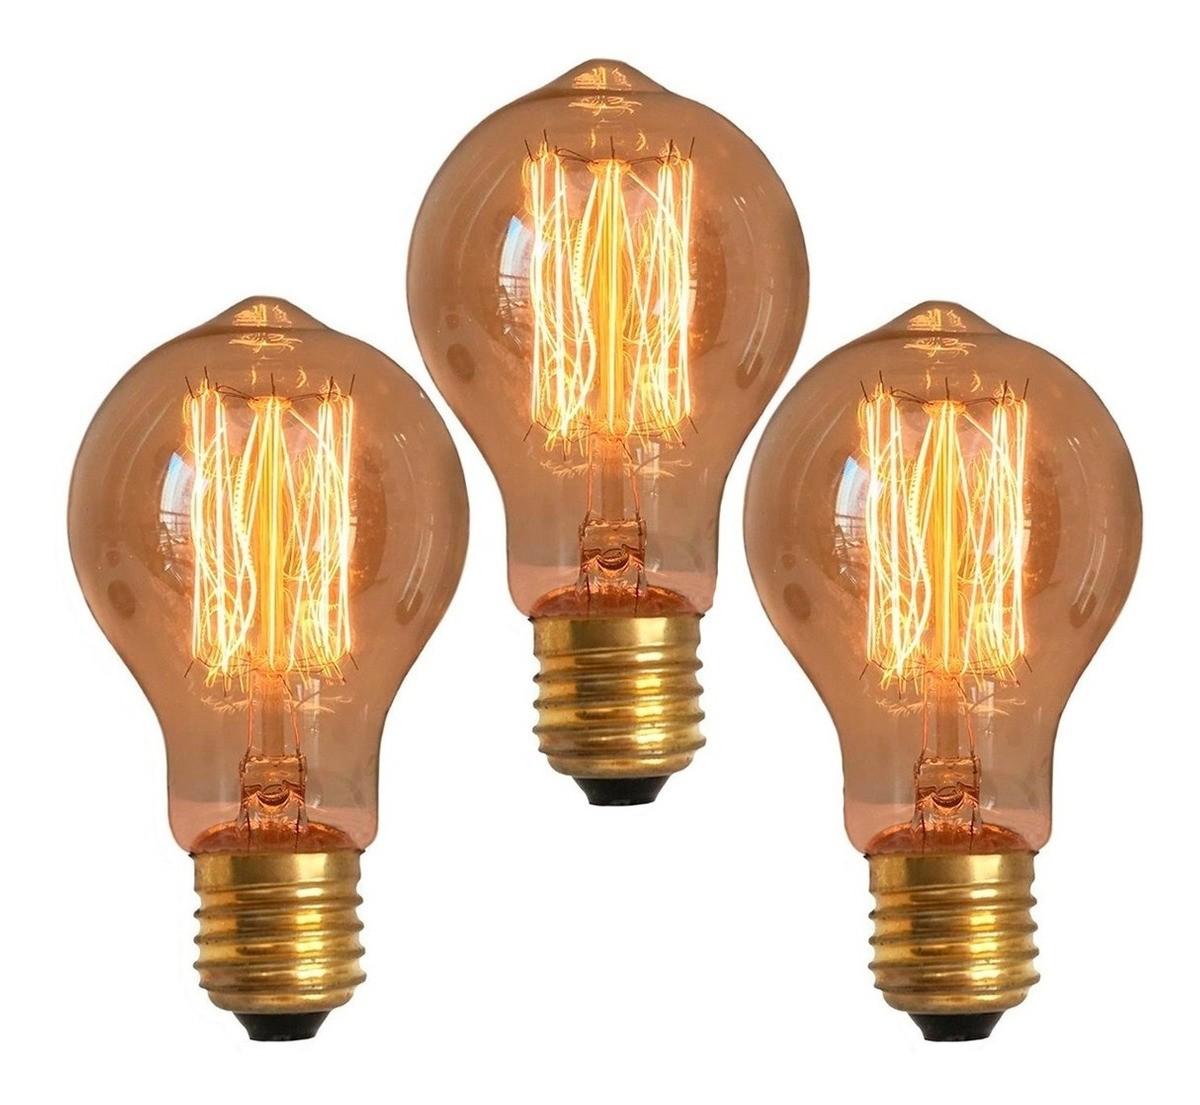 3 Lâmpadas Retrô Decorativa Vintage Thomas Edison A19